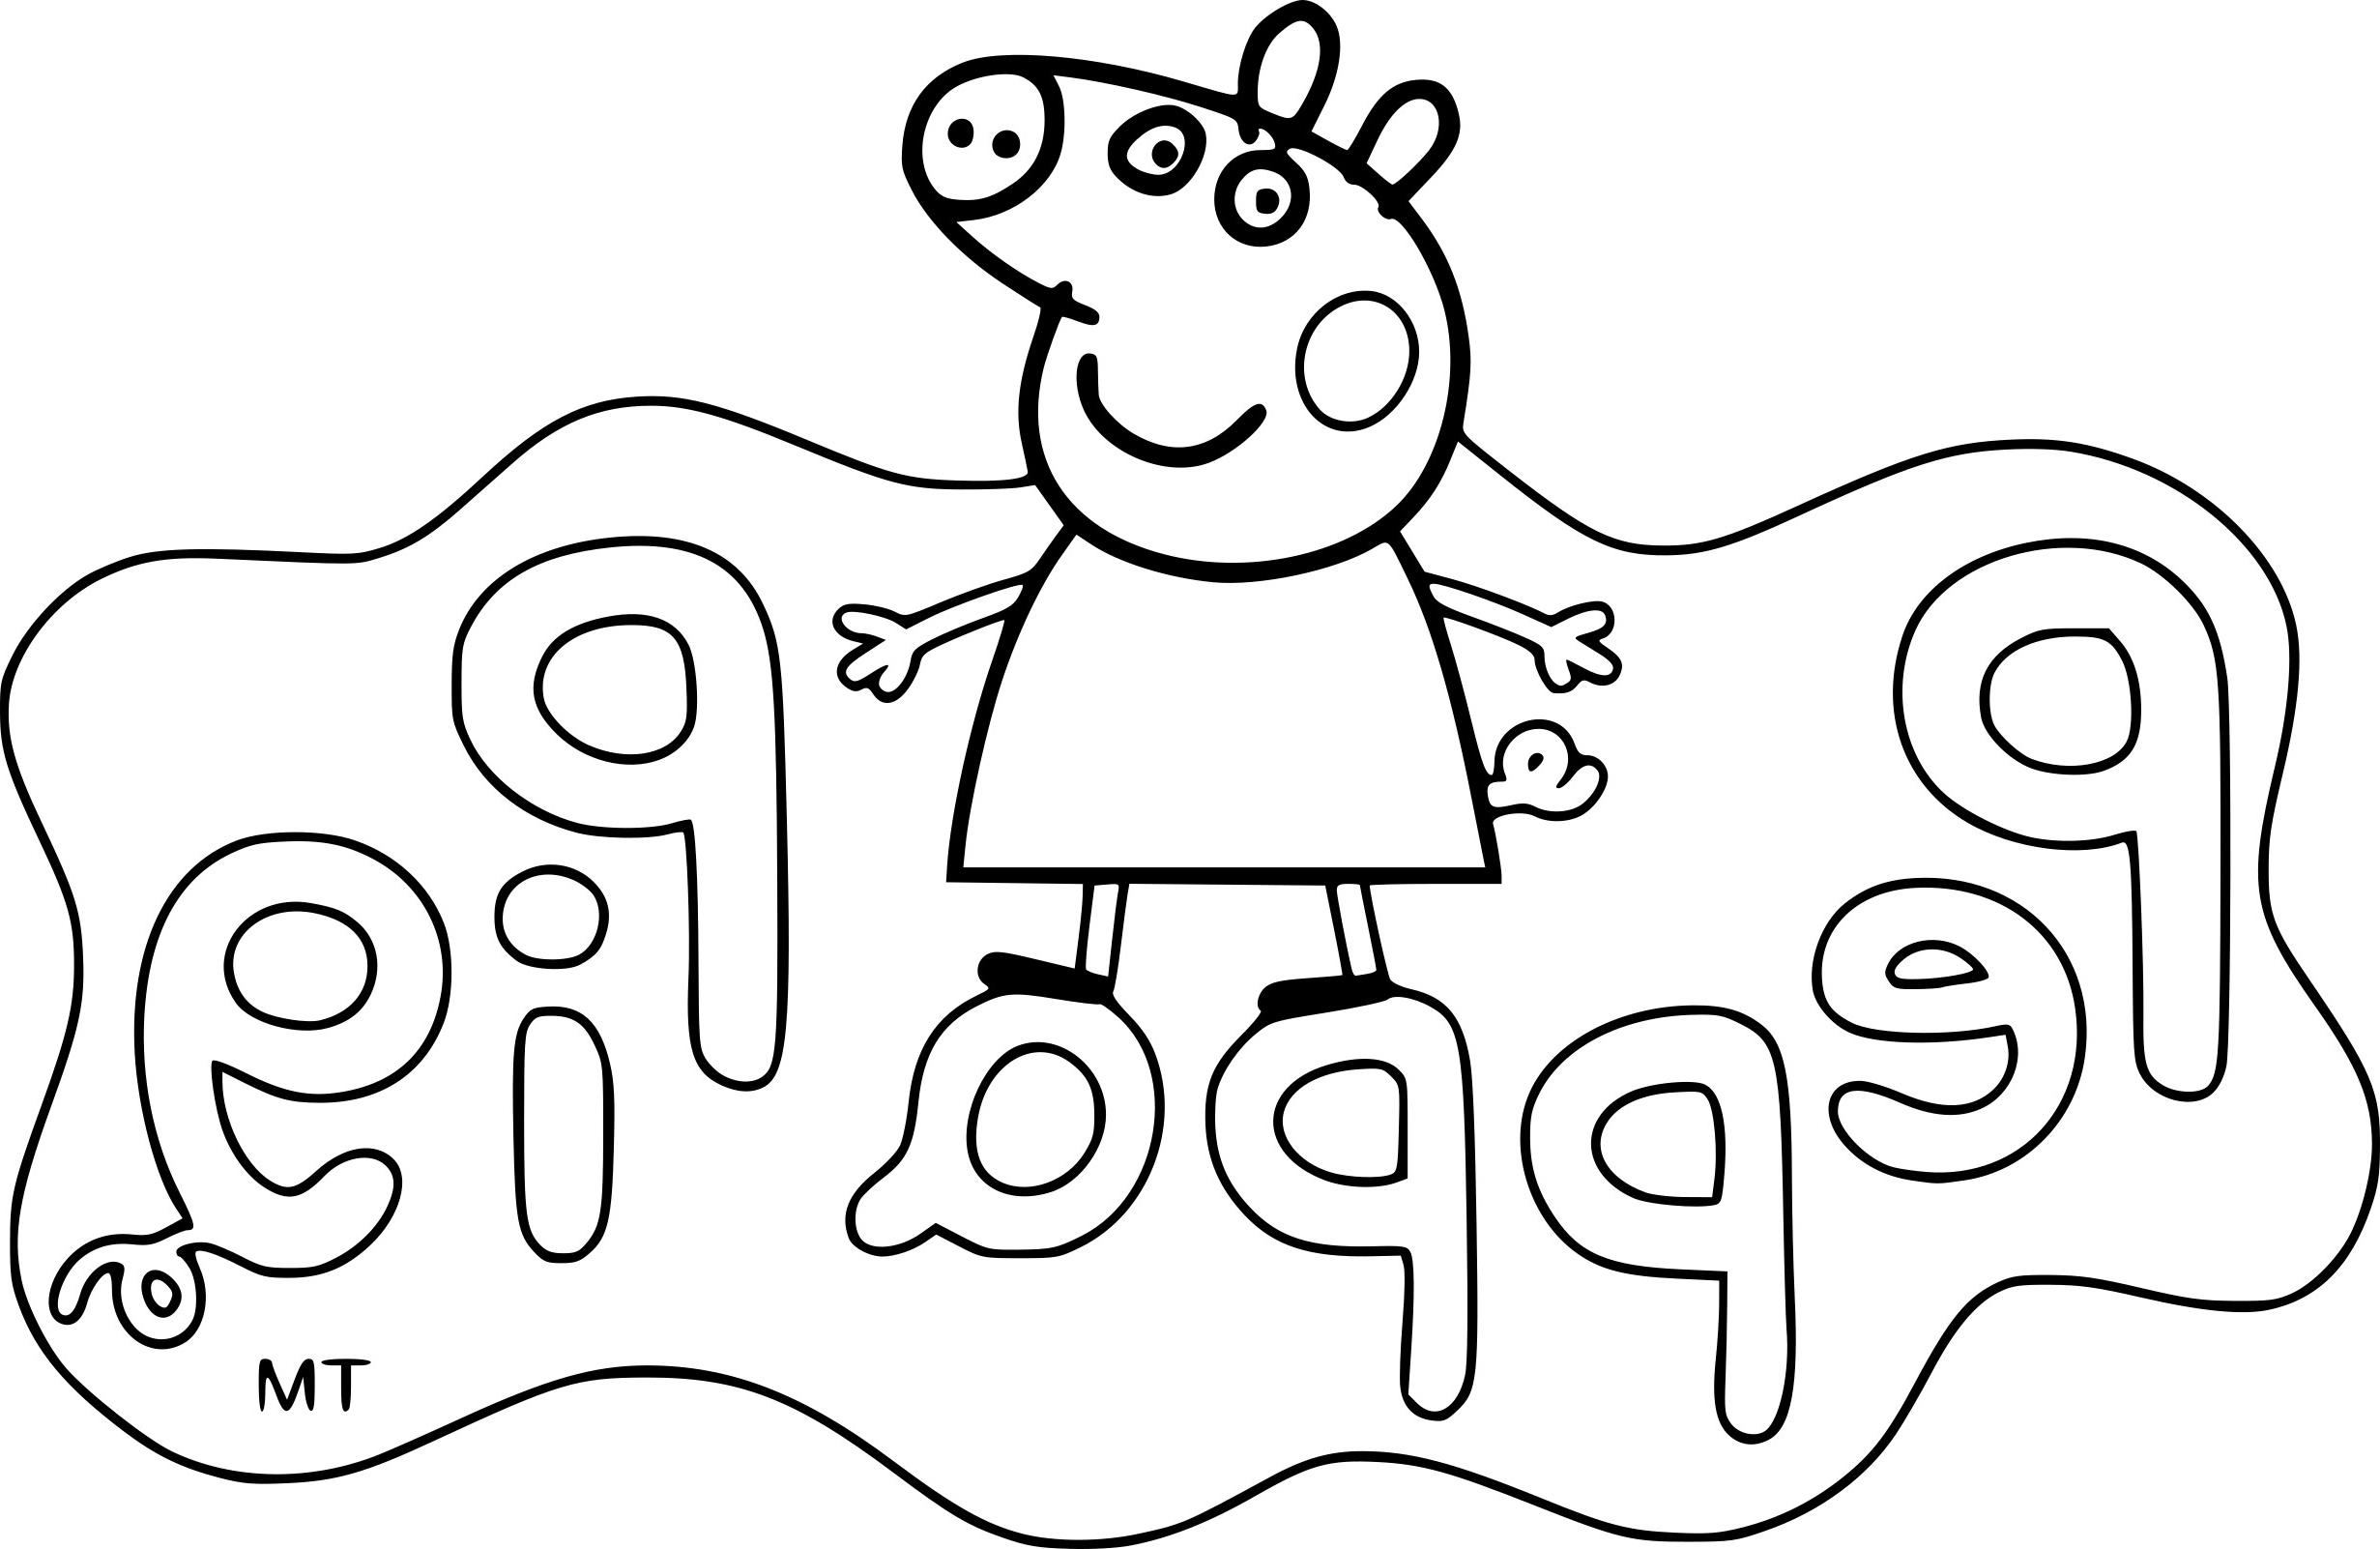 Peppa Pig Coloriage à Imprimer Nouveau Galerie Inspirant Dessins  Colorier Peppa Pig – Mademoiselleosaki